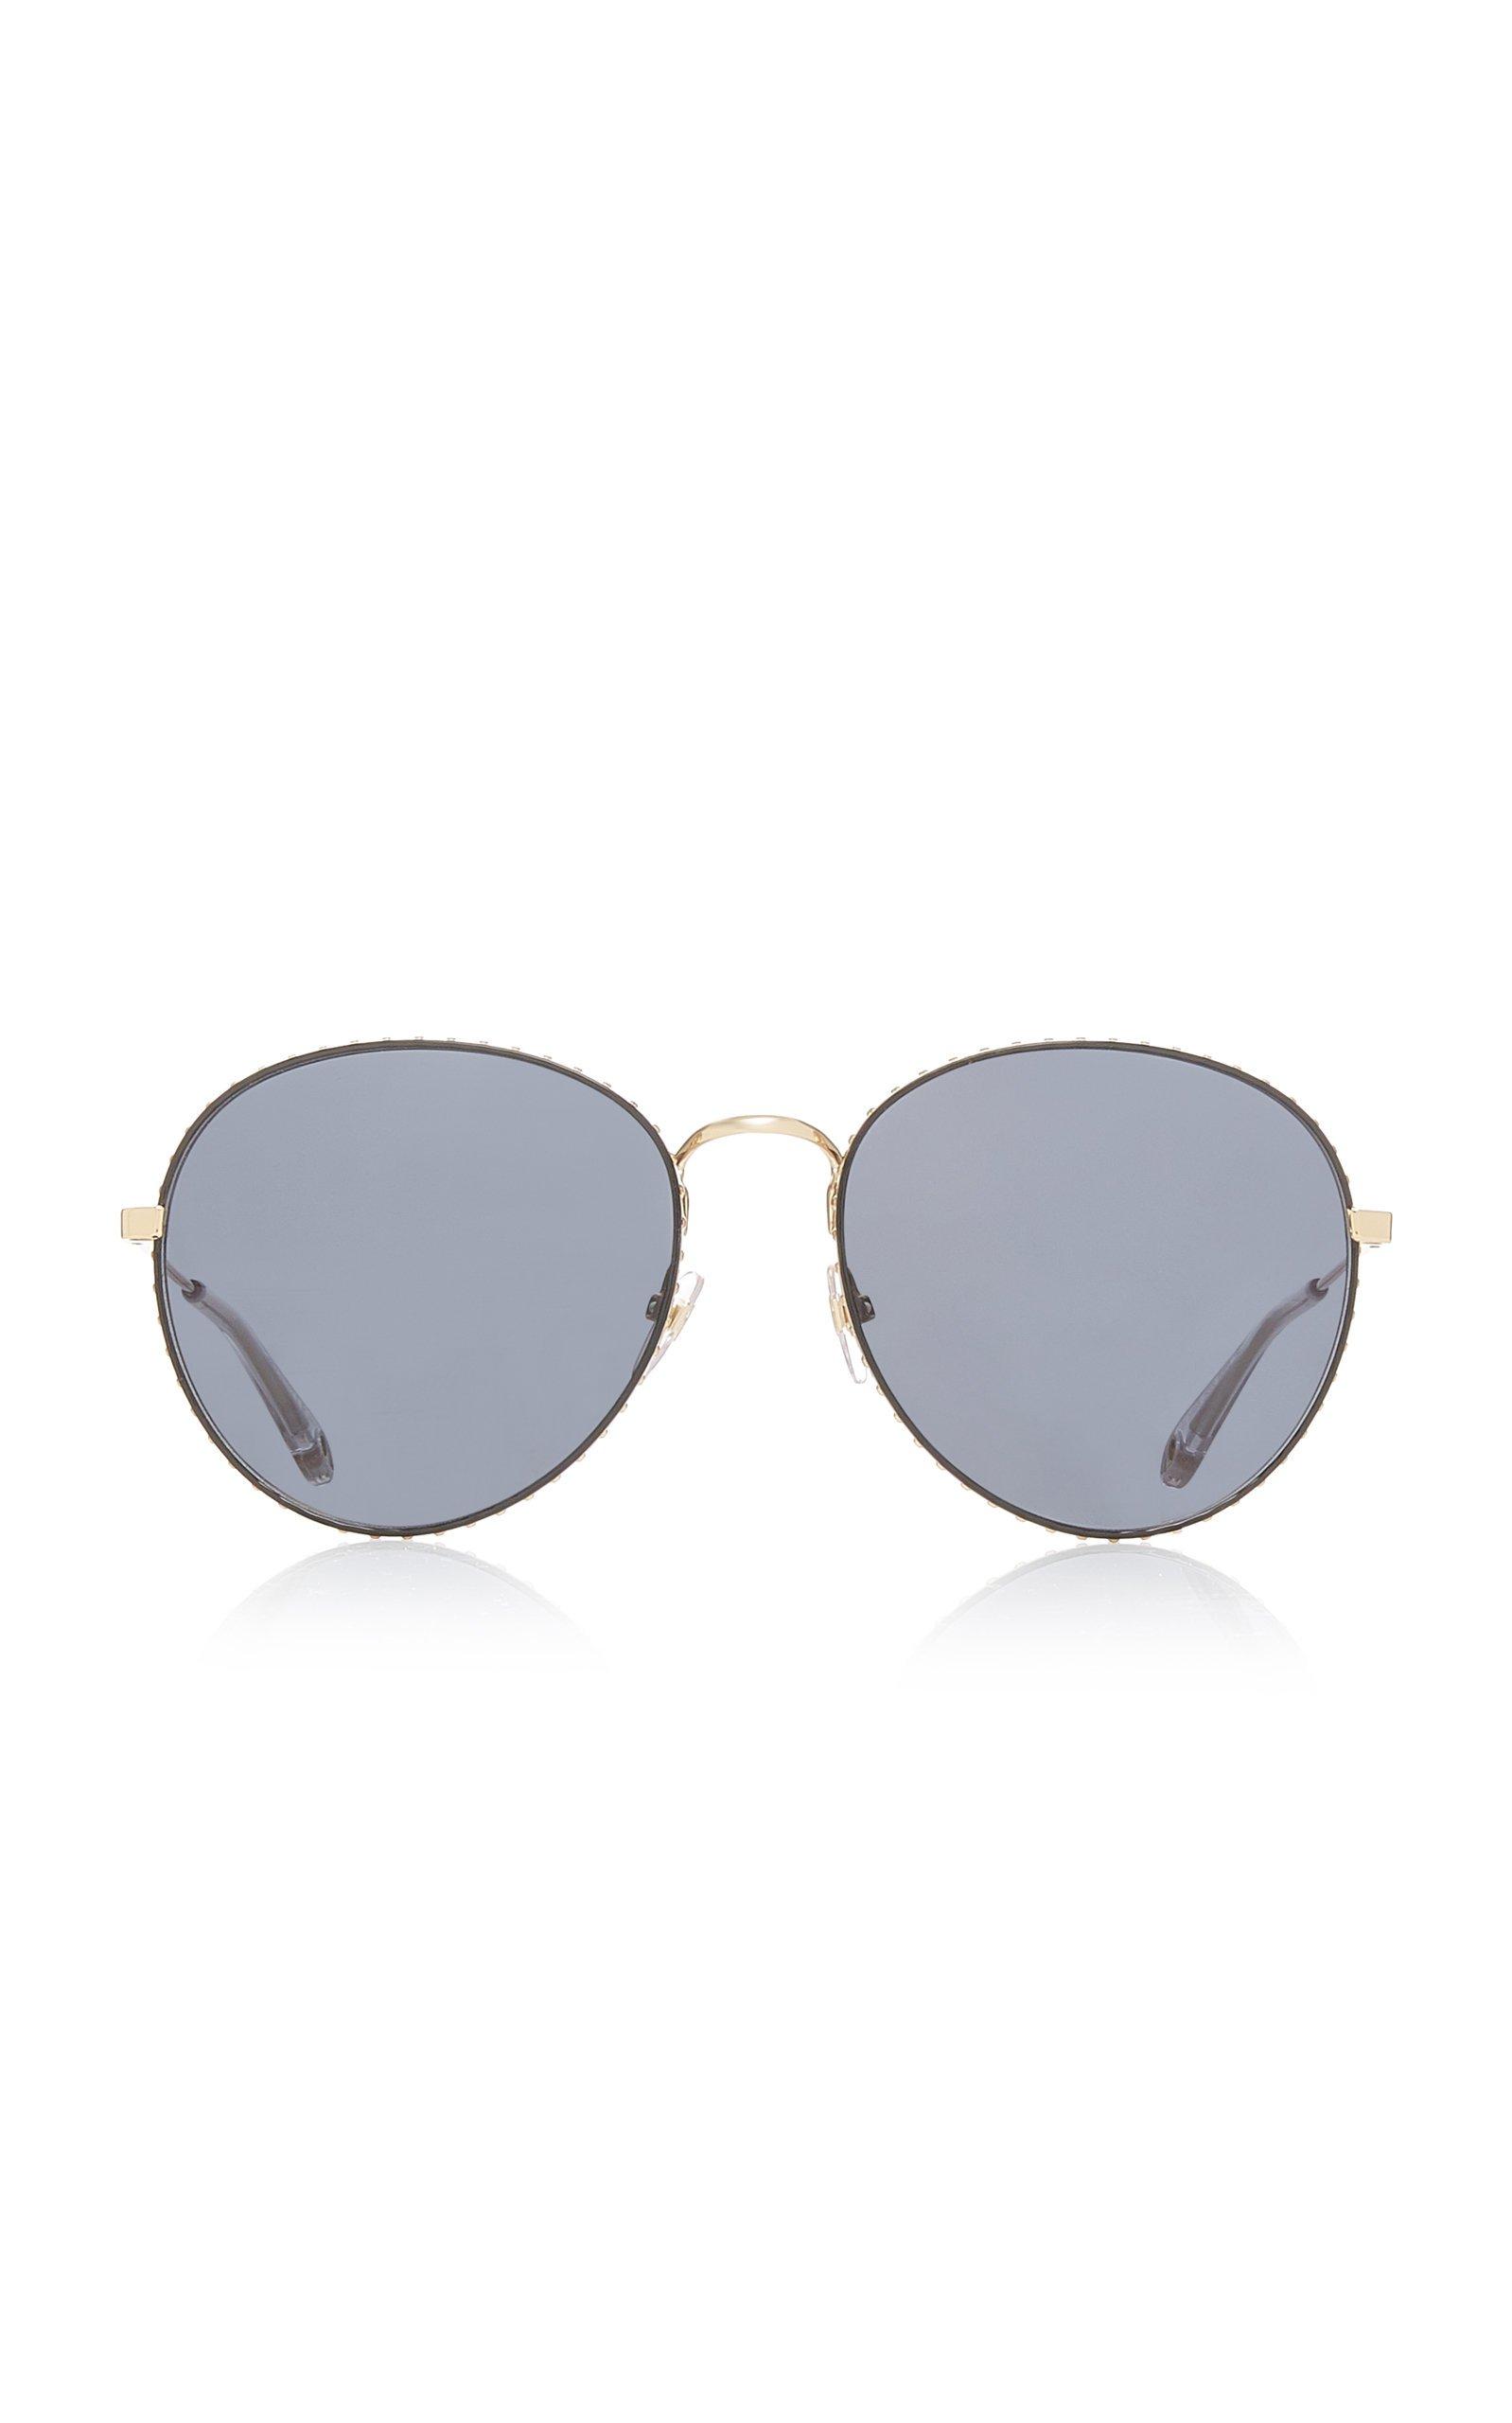 Givenchy Sunglasses Round Sunglasses